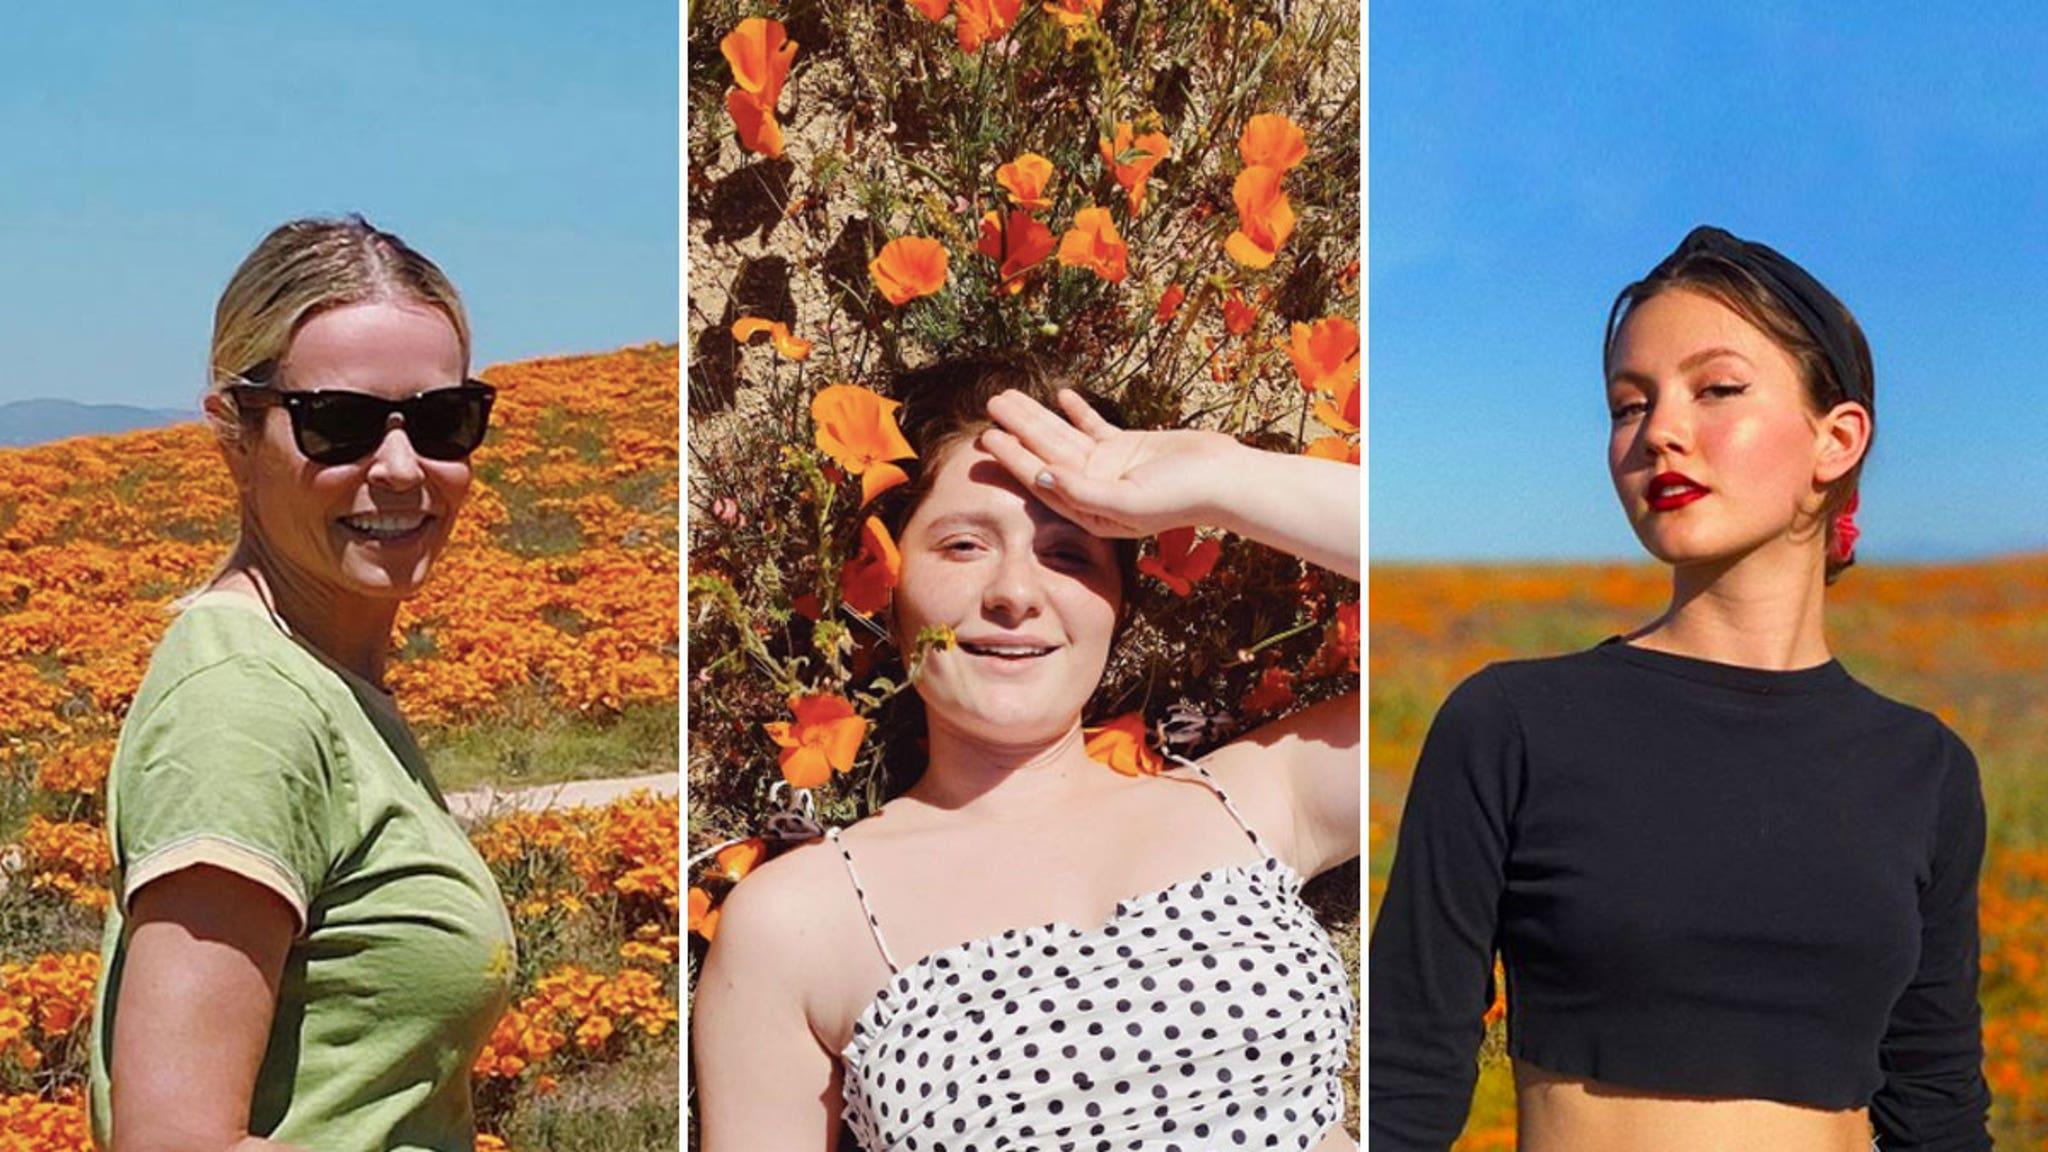 Hollywood #SuperBloom -- Stars Avoid This Year's Poppy Hot Shots